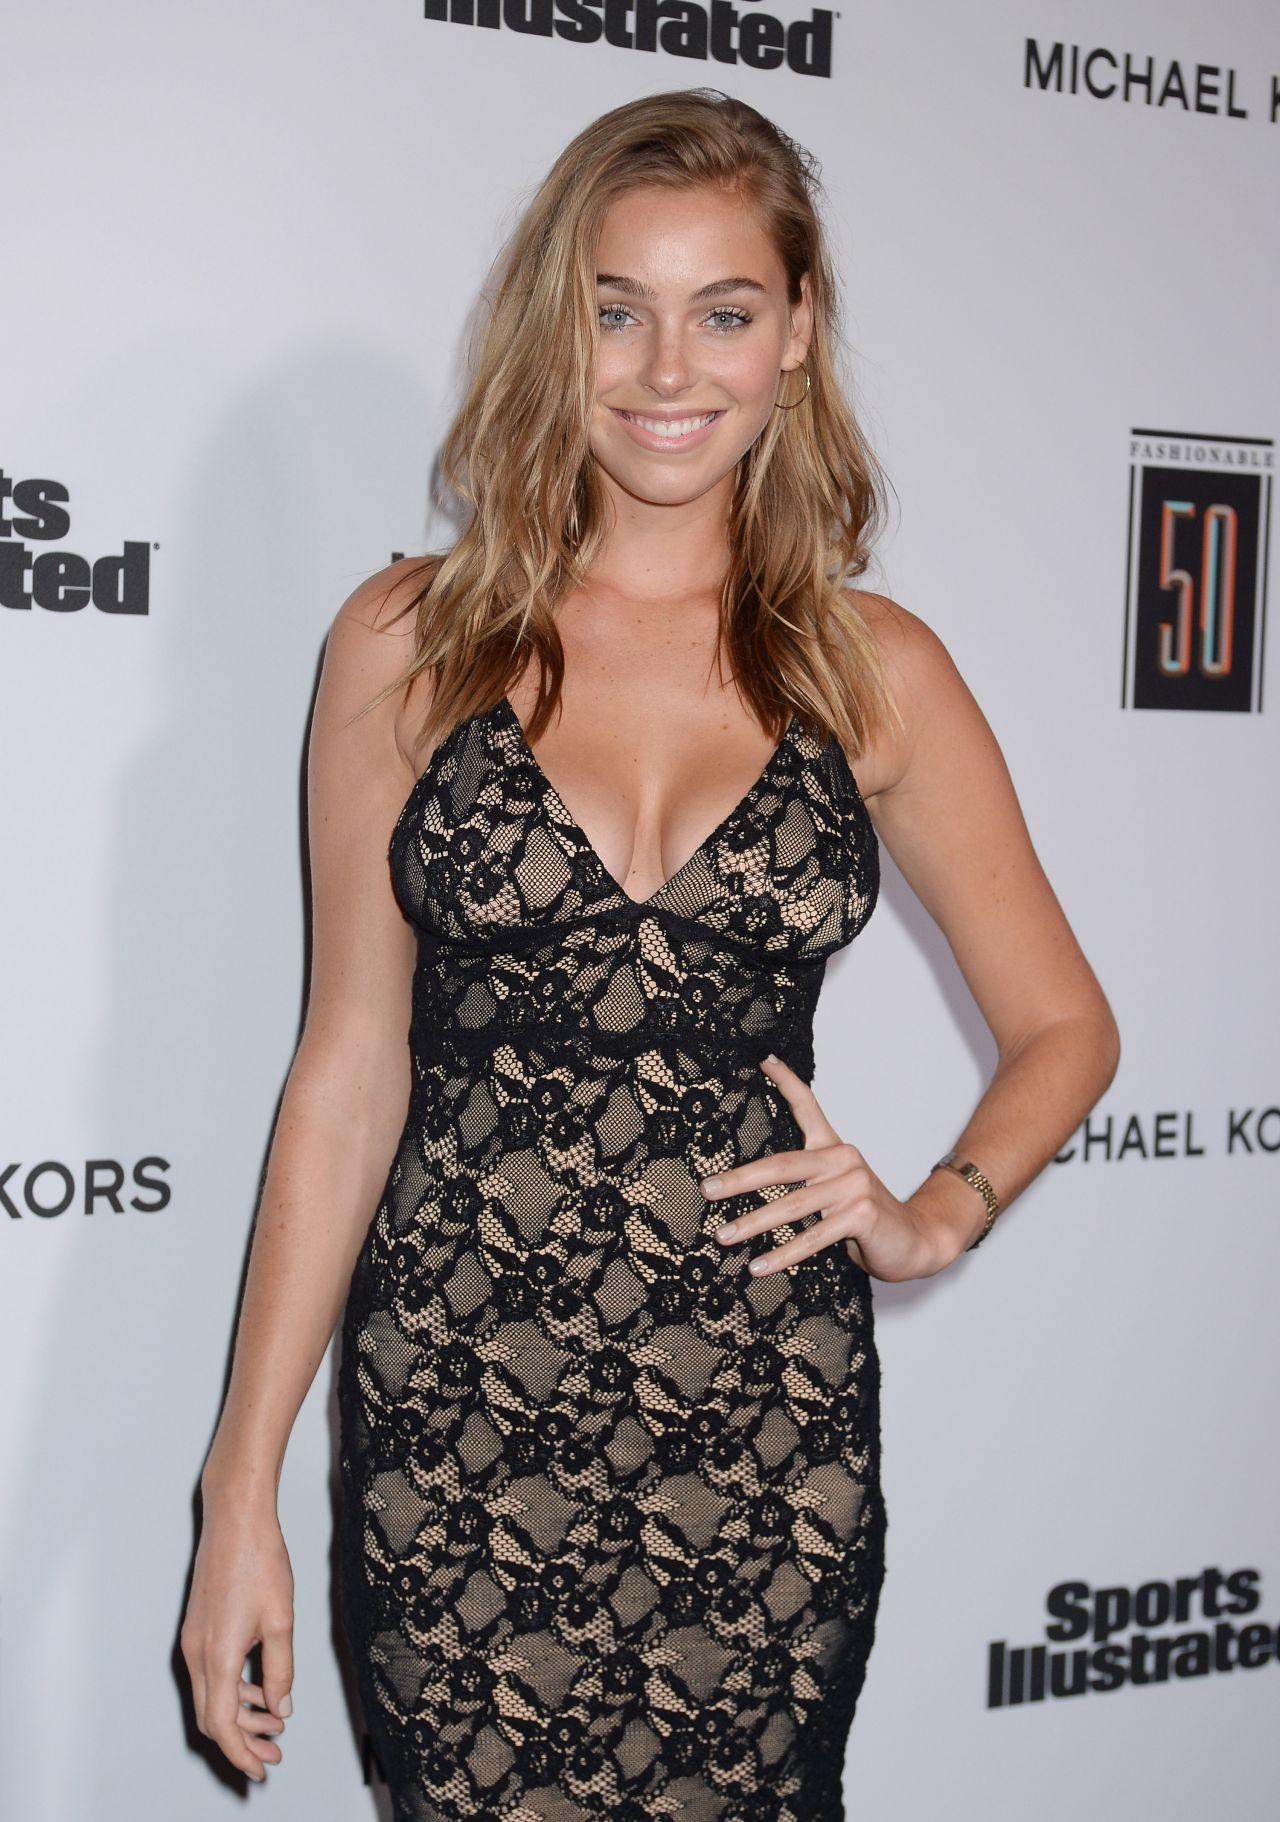 Elizabeth Turner - Sports Illustrated Fashionable 50 in Hollywood 07/18/2017